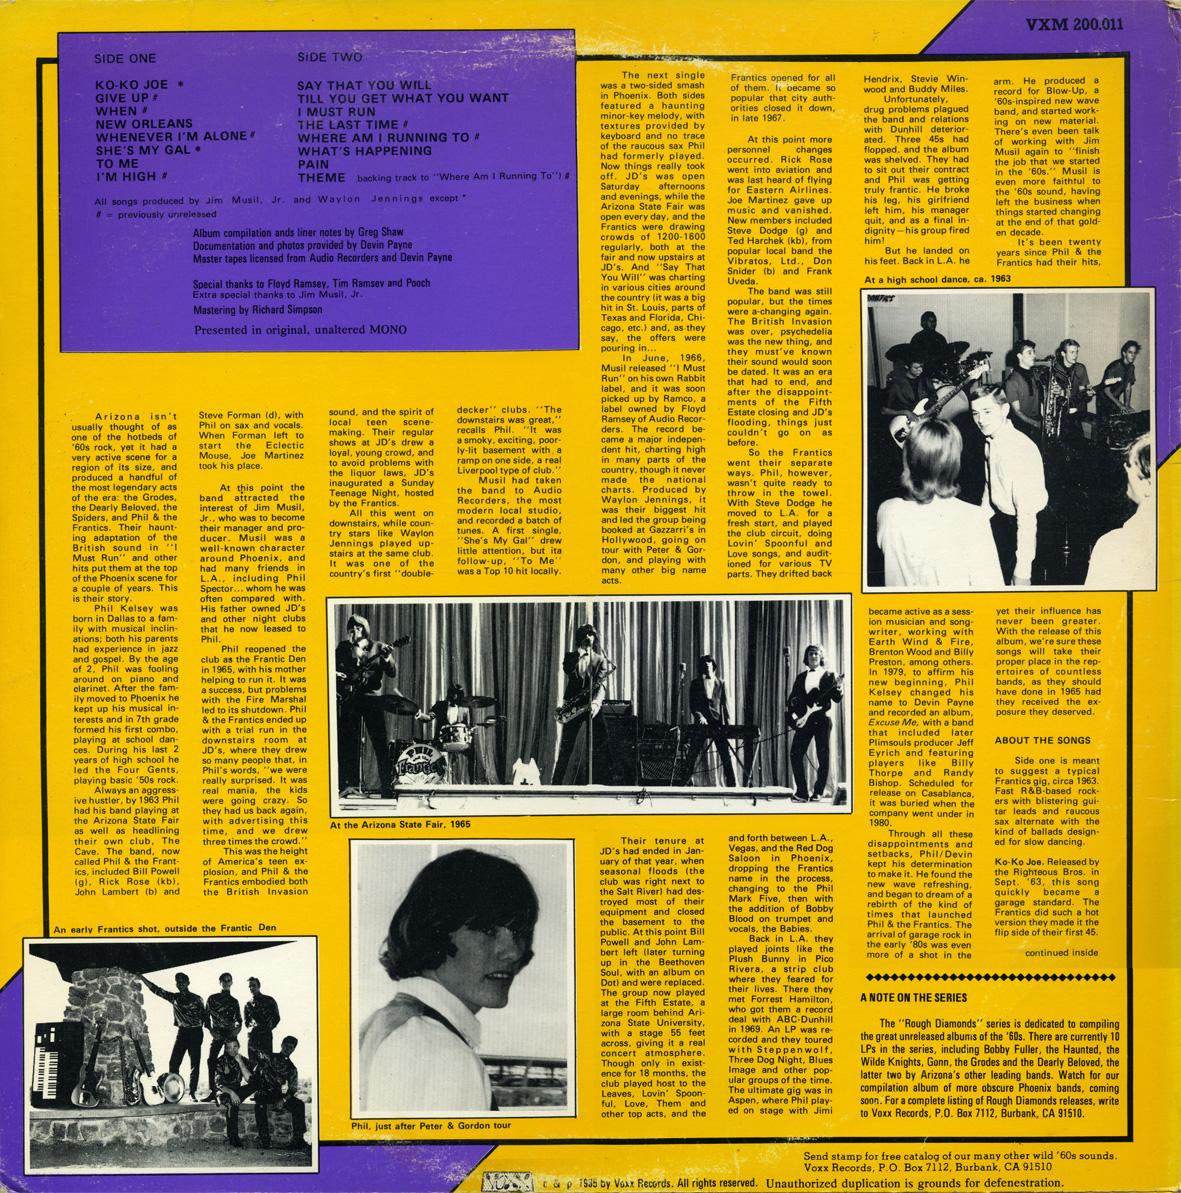 Music Archive: Phil & The Frantics - Rough Diamonds (1964-66)